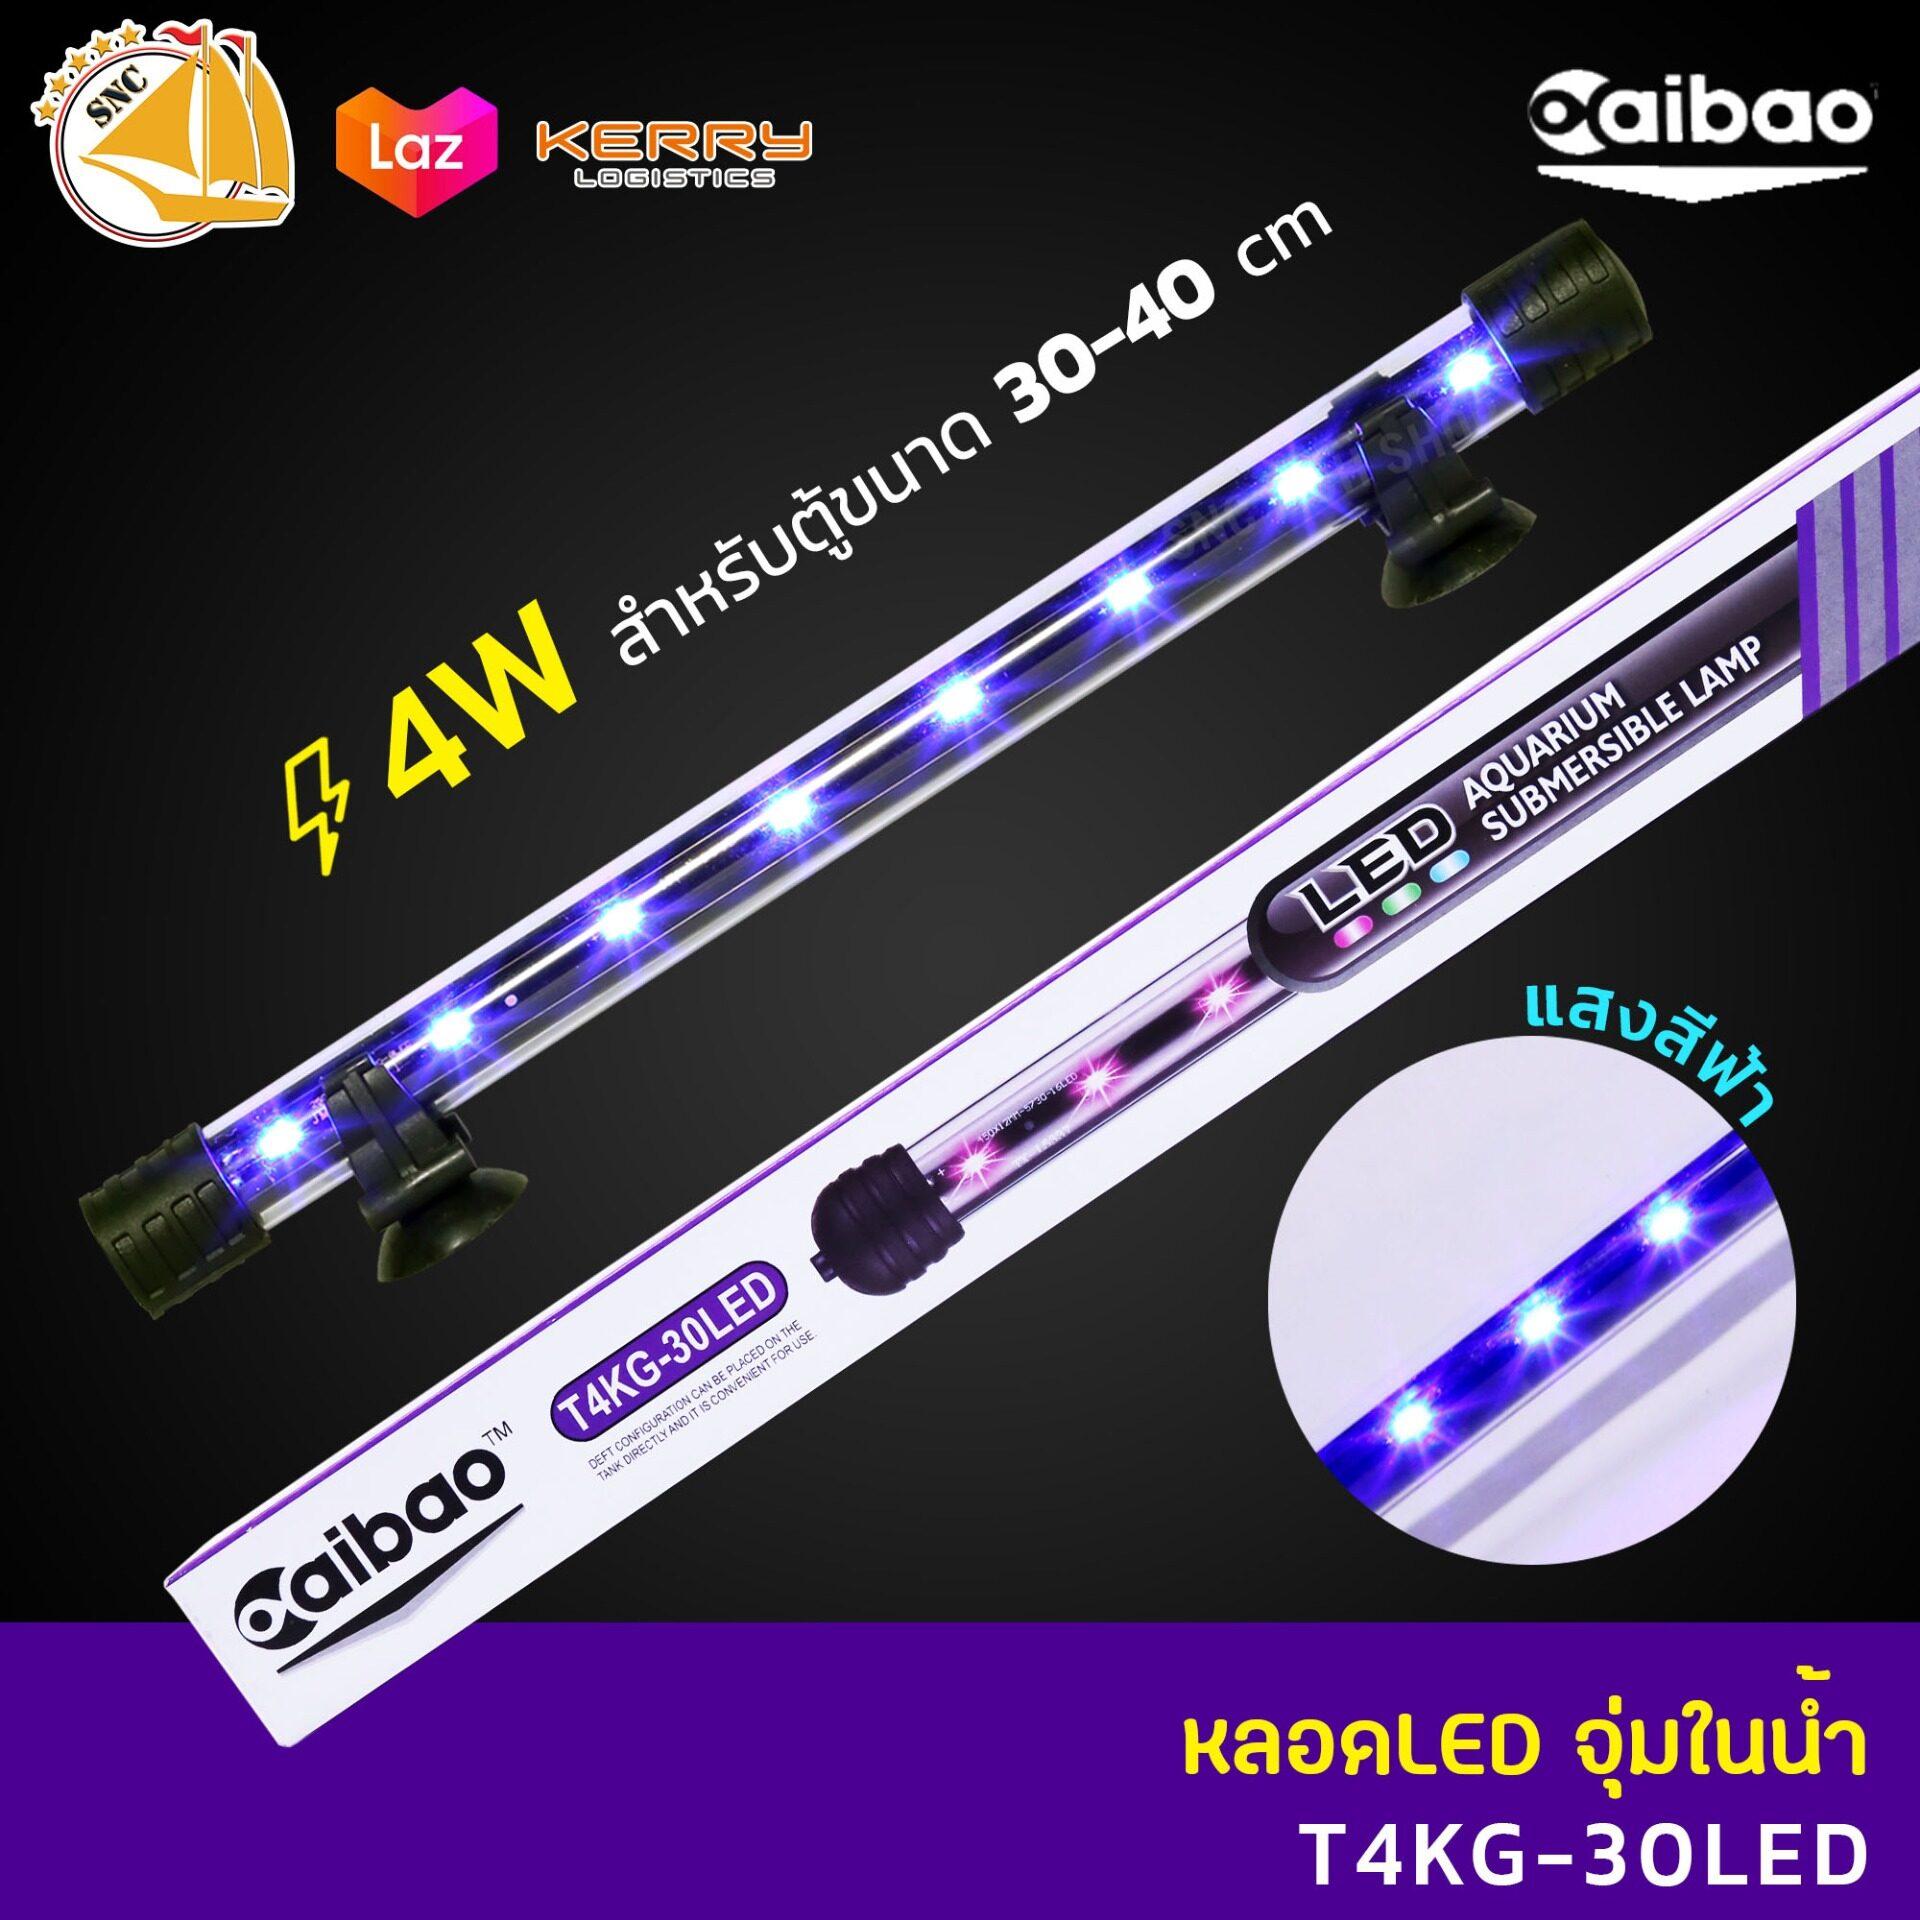 Caibao T4KG-30LED หลอดไฟ LED จุ่มน้ำ (สีขาว สีน้ำเงิน สีชมพู สีRGB)